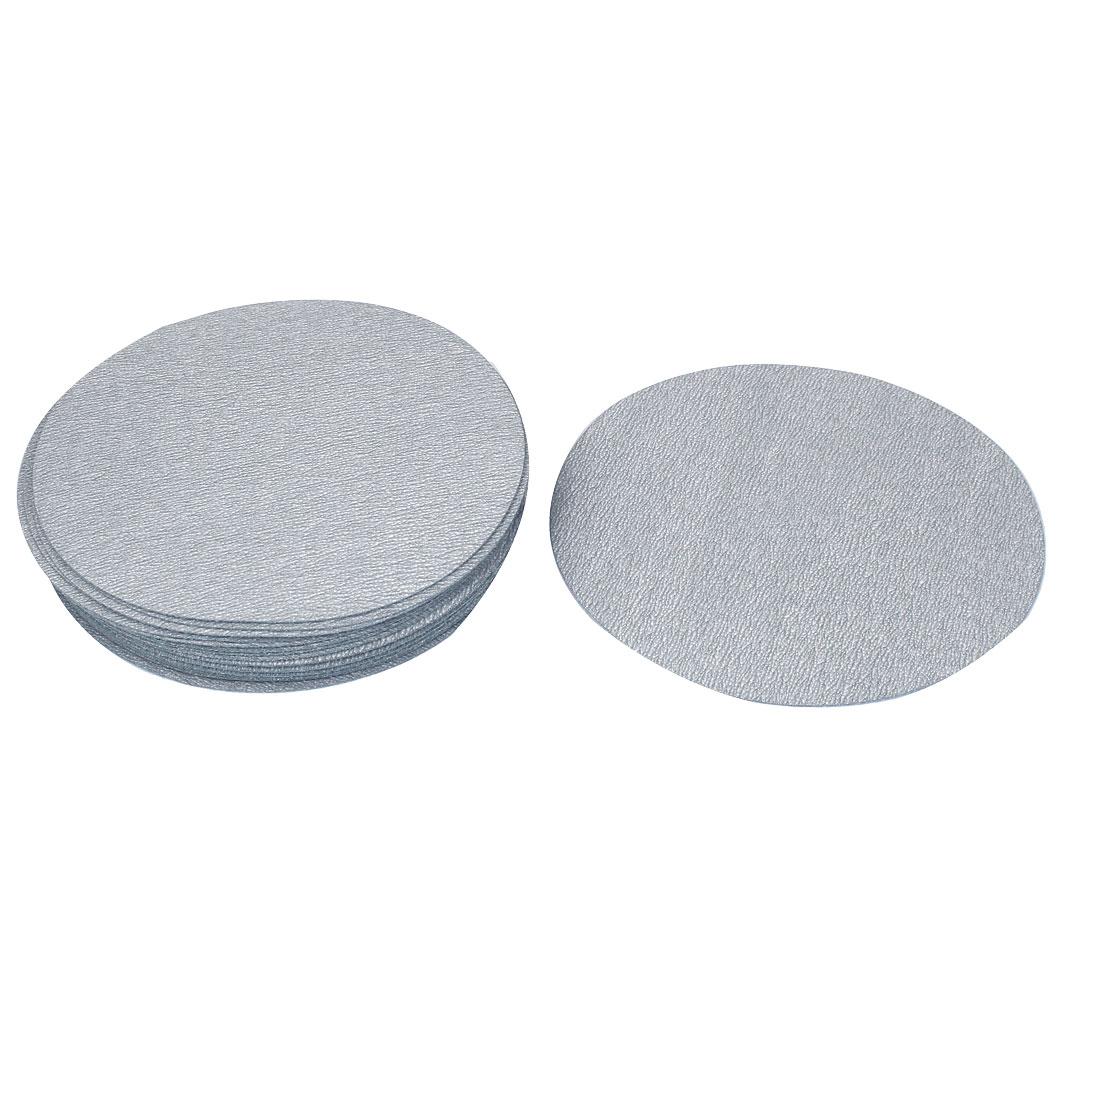 "6"" Dia Polishing Round Dry Abrasive Sanding Sandpaper Sheet Disc 800 Grit 20pcs"